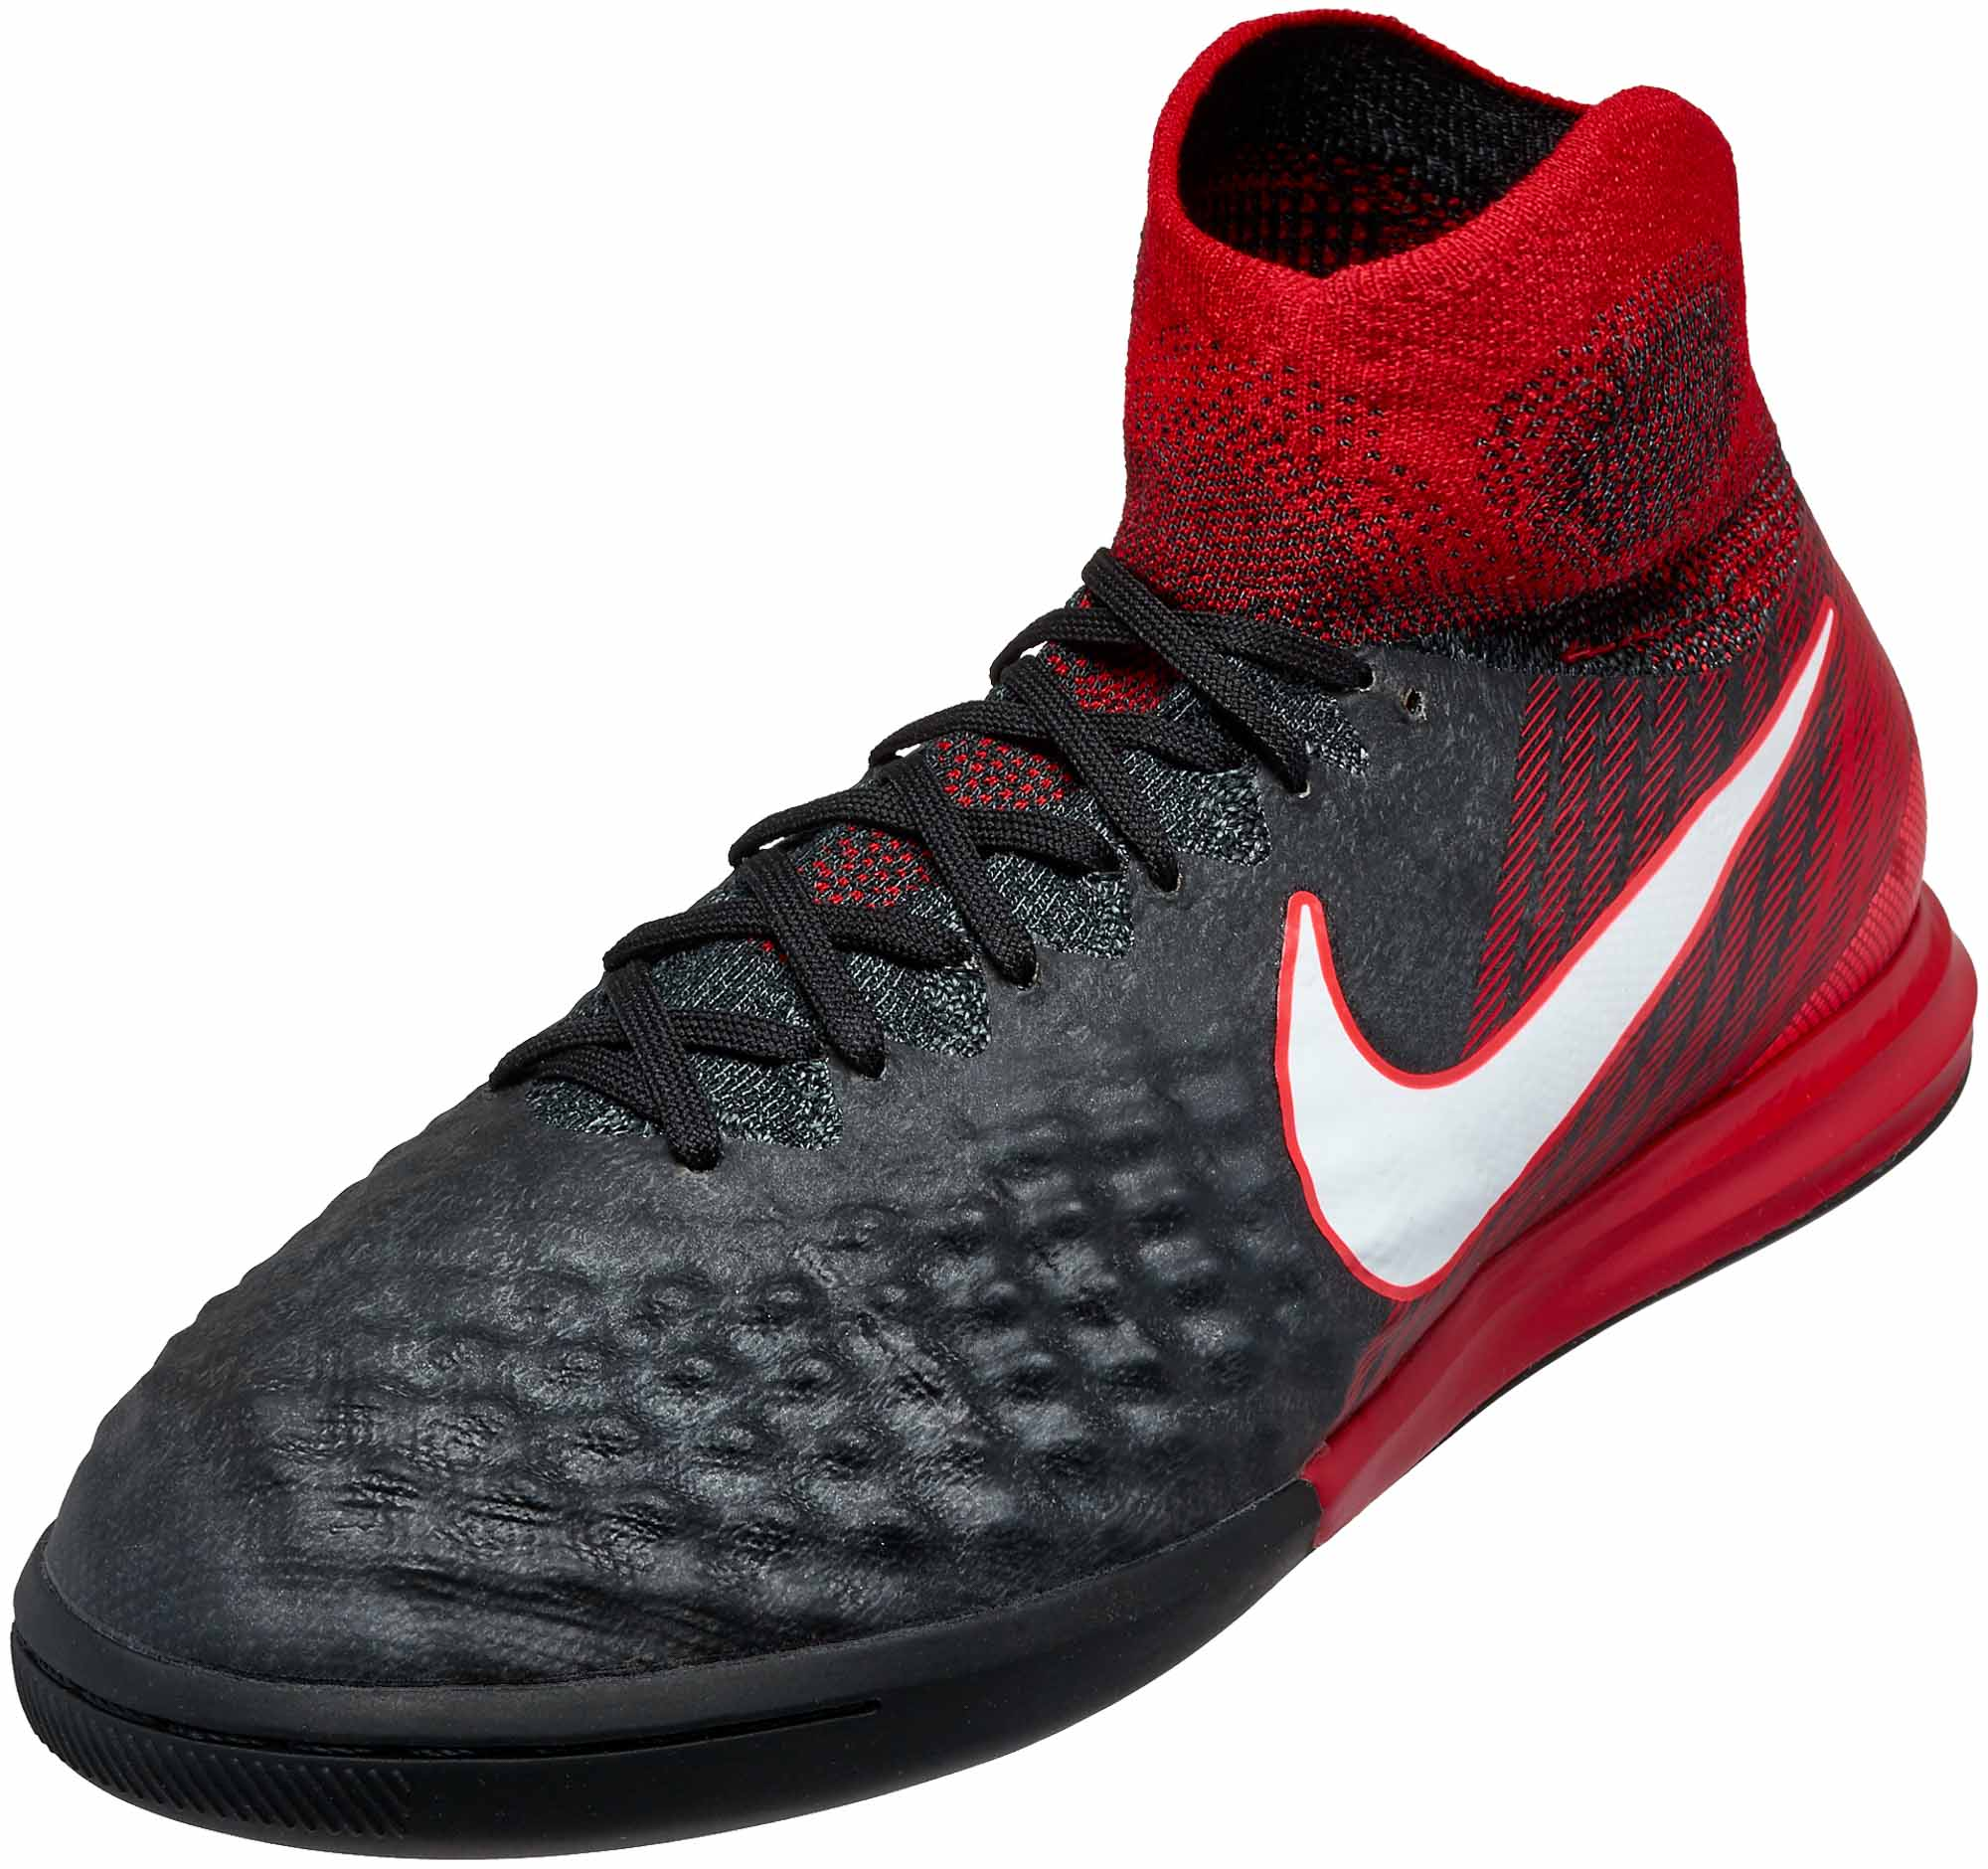 8cd3d77d3b57 Nike MagistaX Proximo II IC - Black   White - Soccer Master